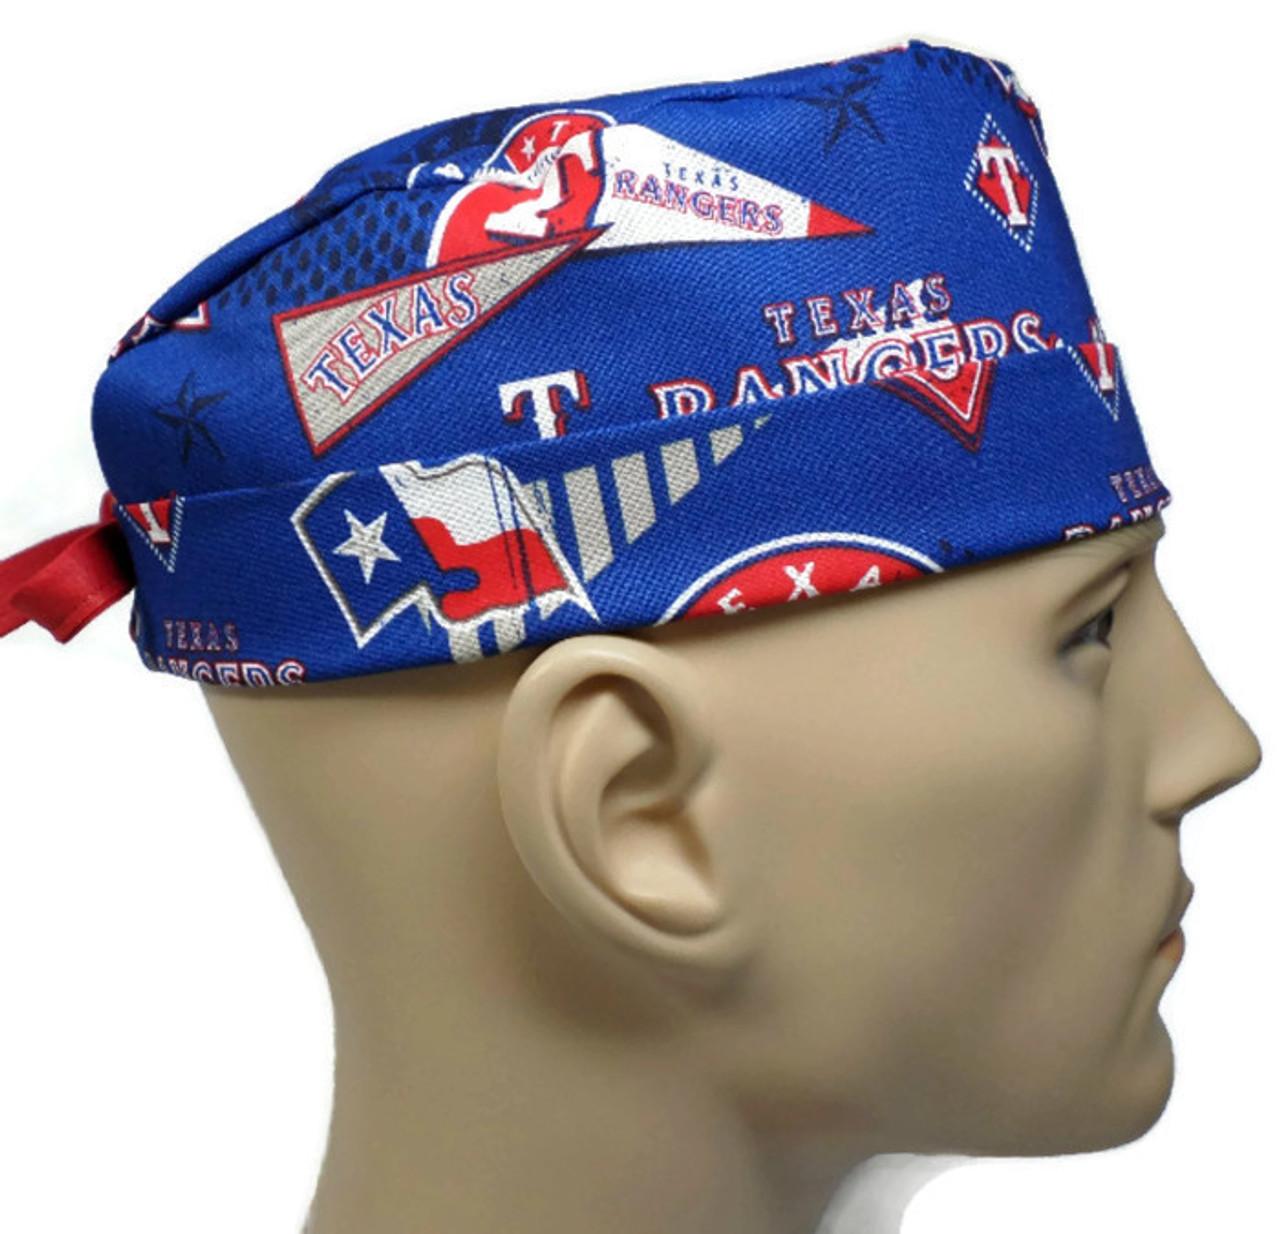 e7343f3dbd5 Men's Adjustable Fold-Up Cuffed or Un-Cuffed Surgical Scrub Hat Cap  Handmade with ...